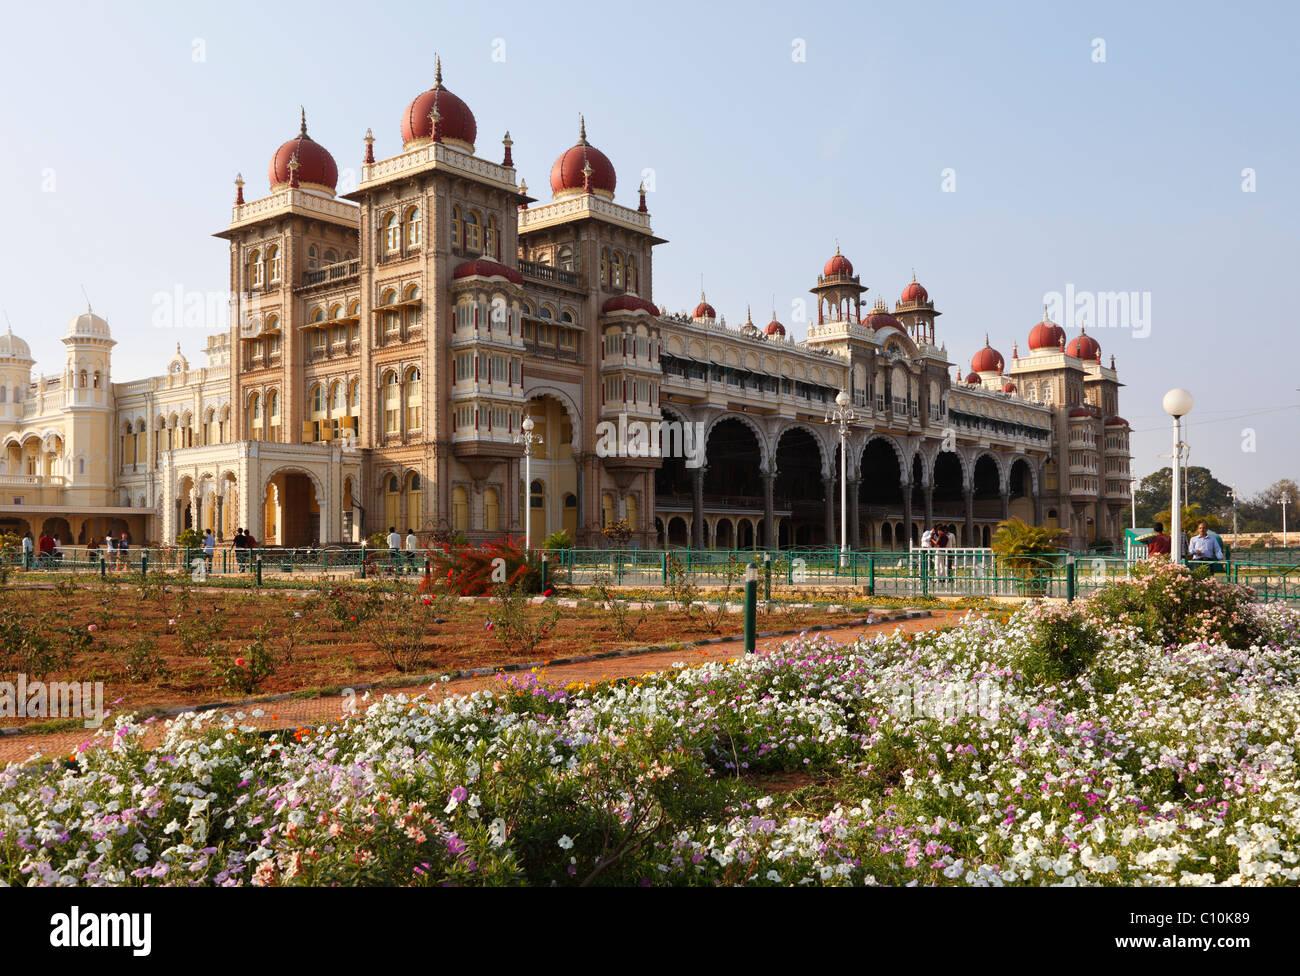 Maharaja Palace, Mysore Palace, Mysore, Karnataka, South India, India, South Asia, Asia - Stock Image